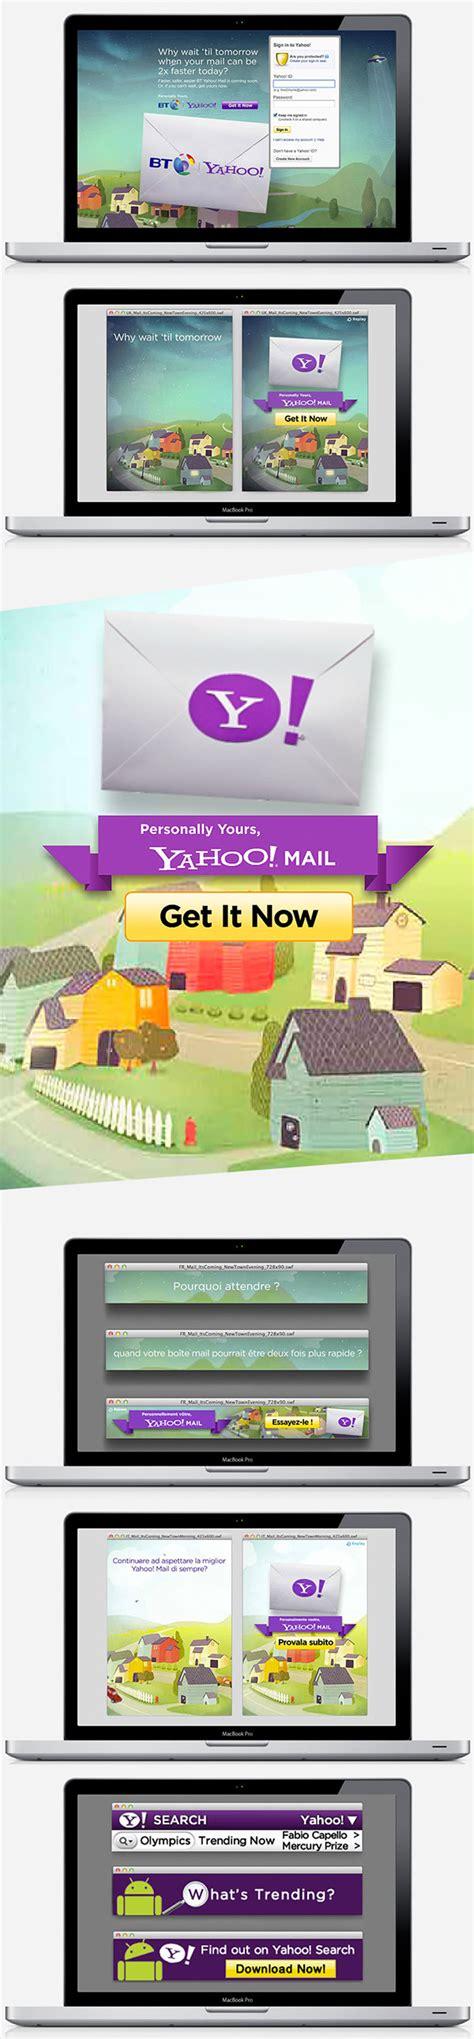 bt yahoo mail page layout yahoo on behance